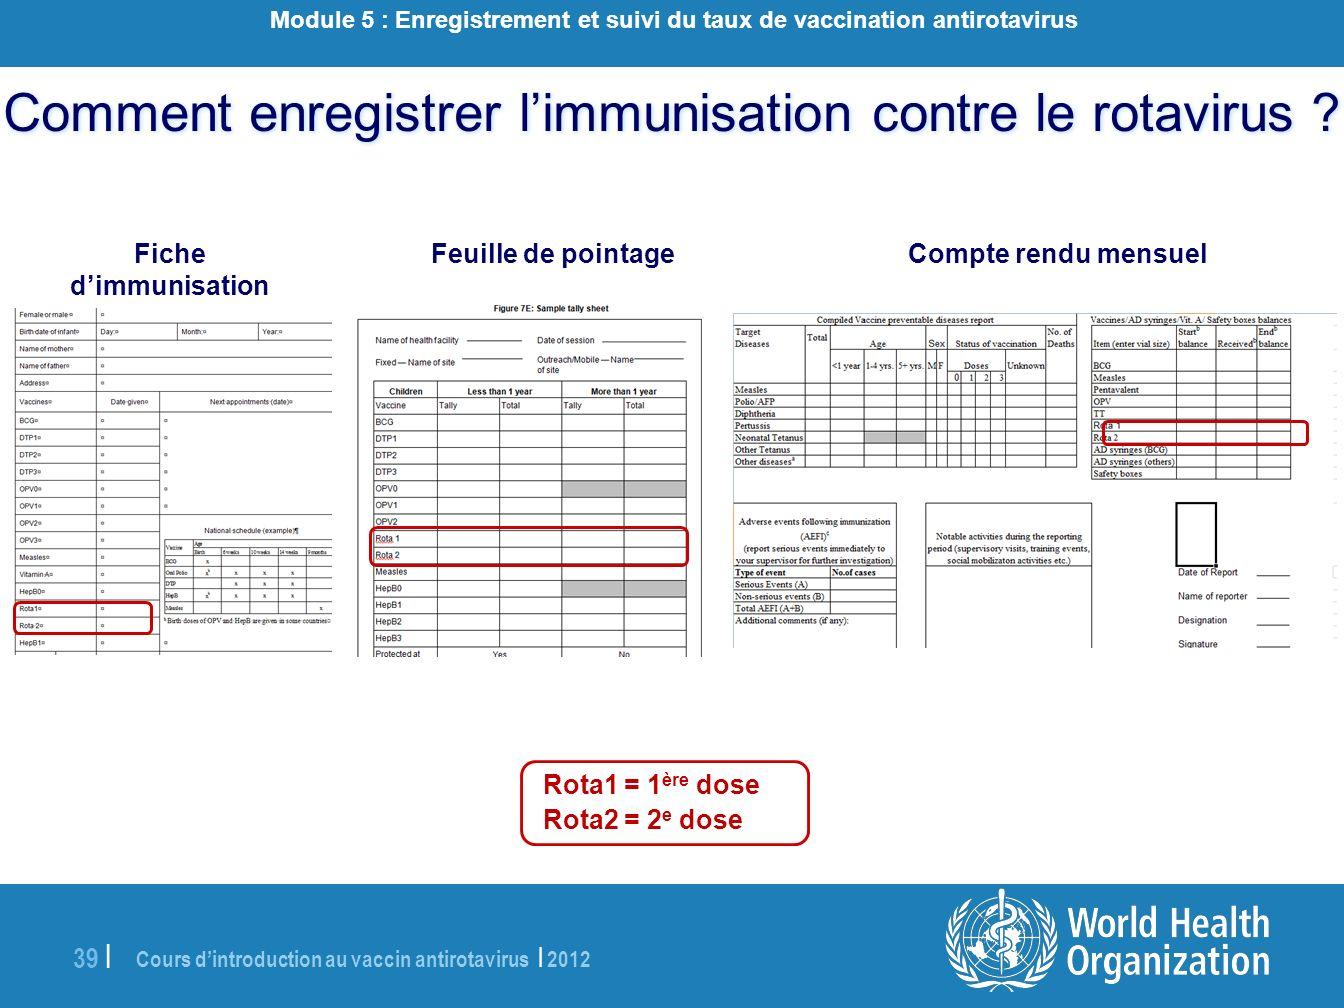 Comment enregistrer l'immunisation contre le rotavirus